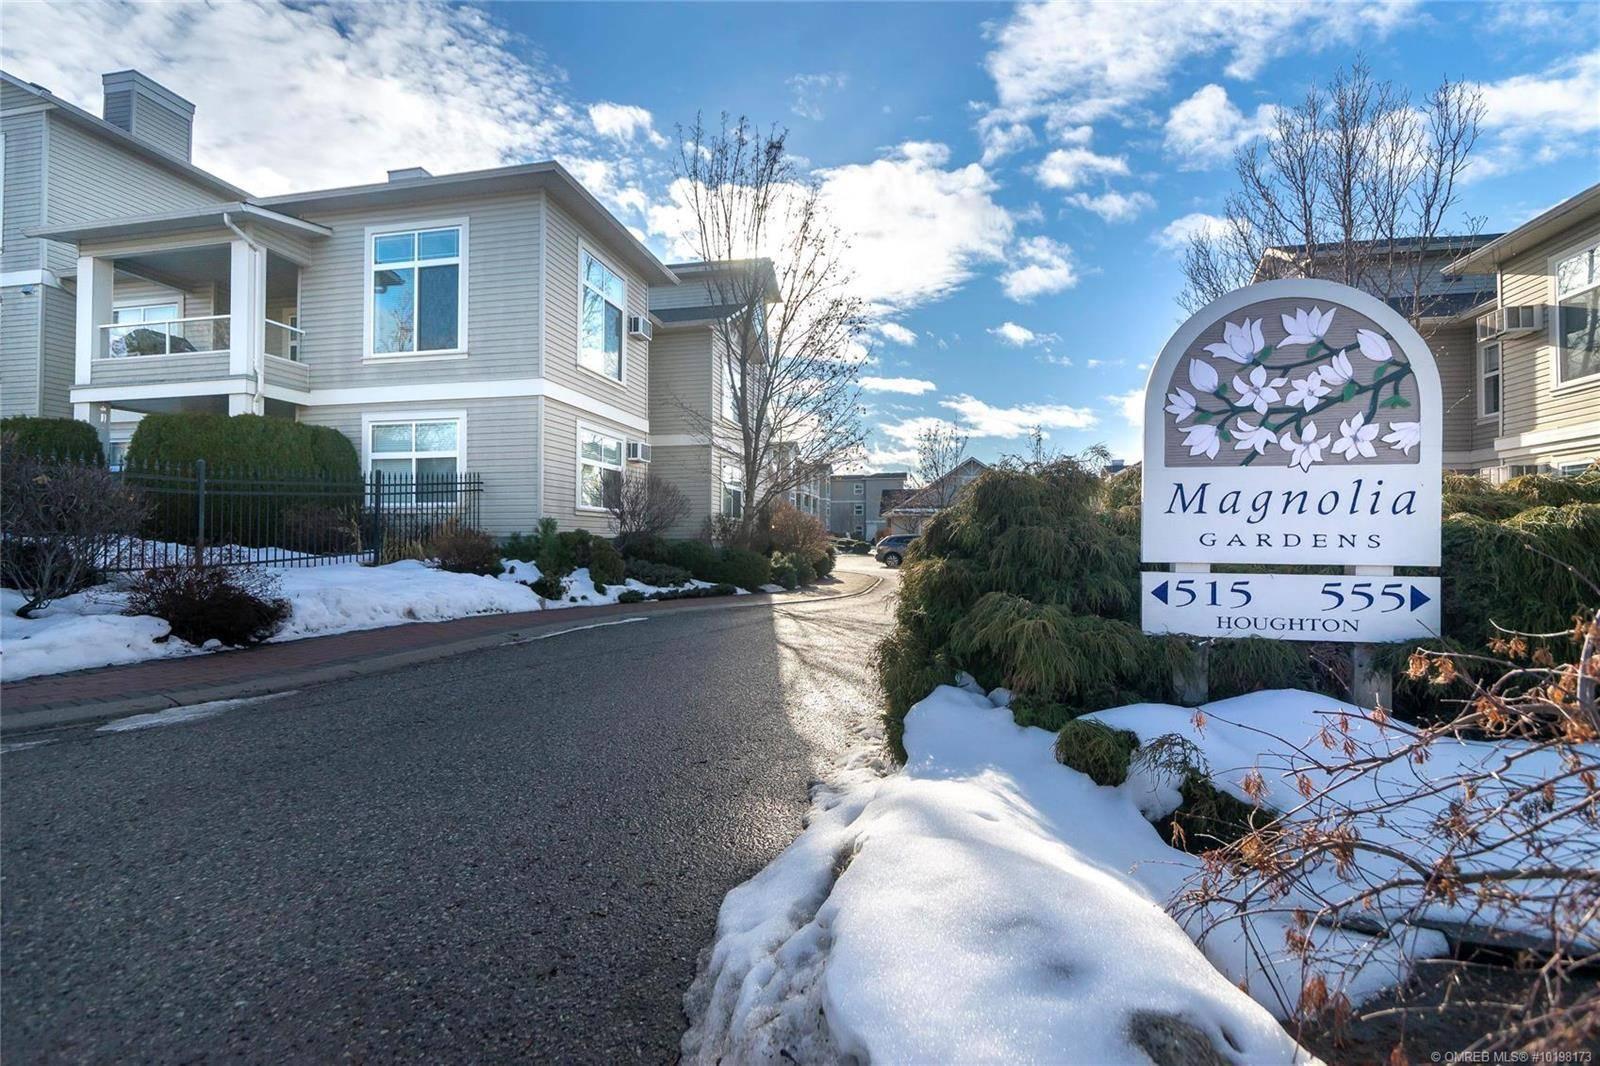 Condo for sale at 515 Houghton Rd Unit 207 Kelowna British Columbia - MLS: 10198173